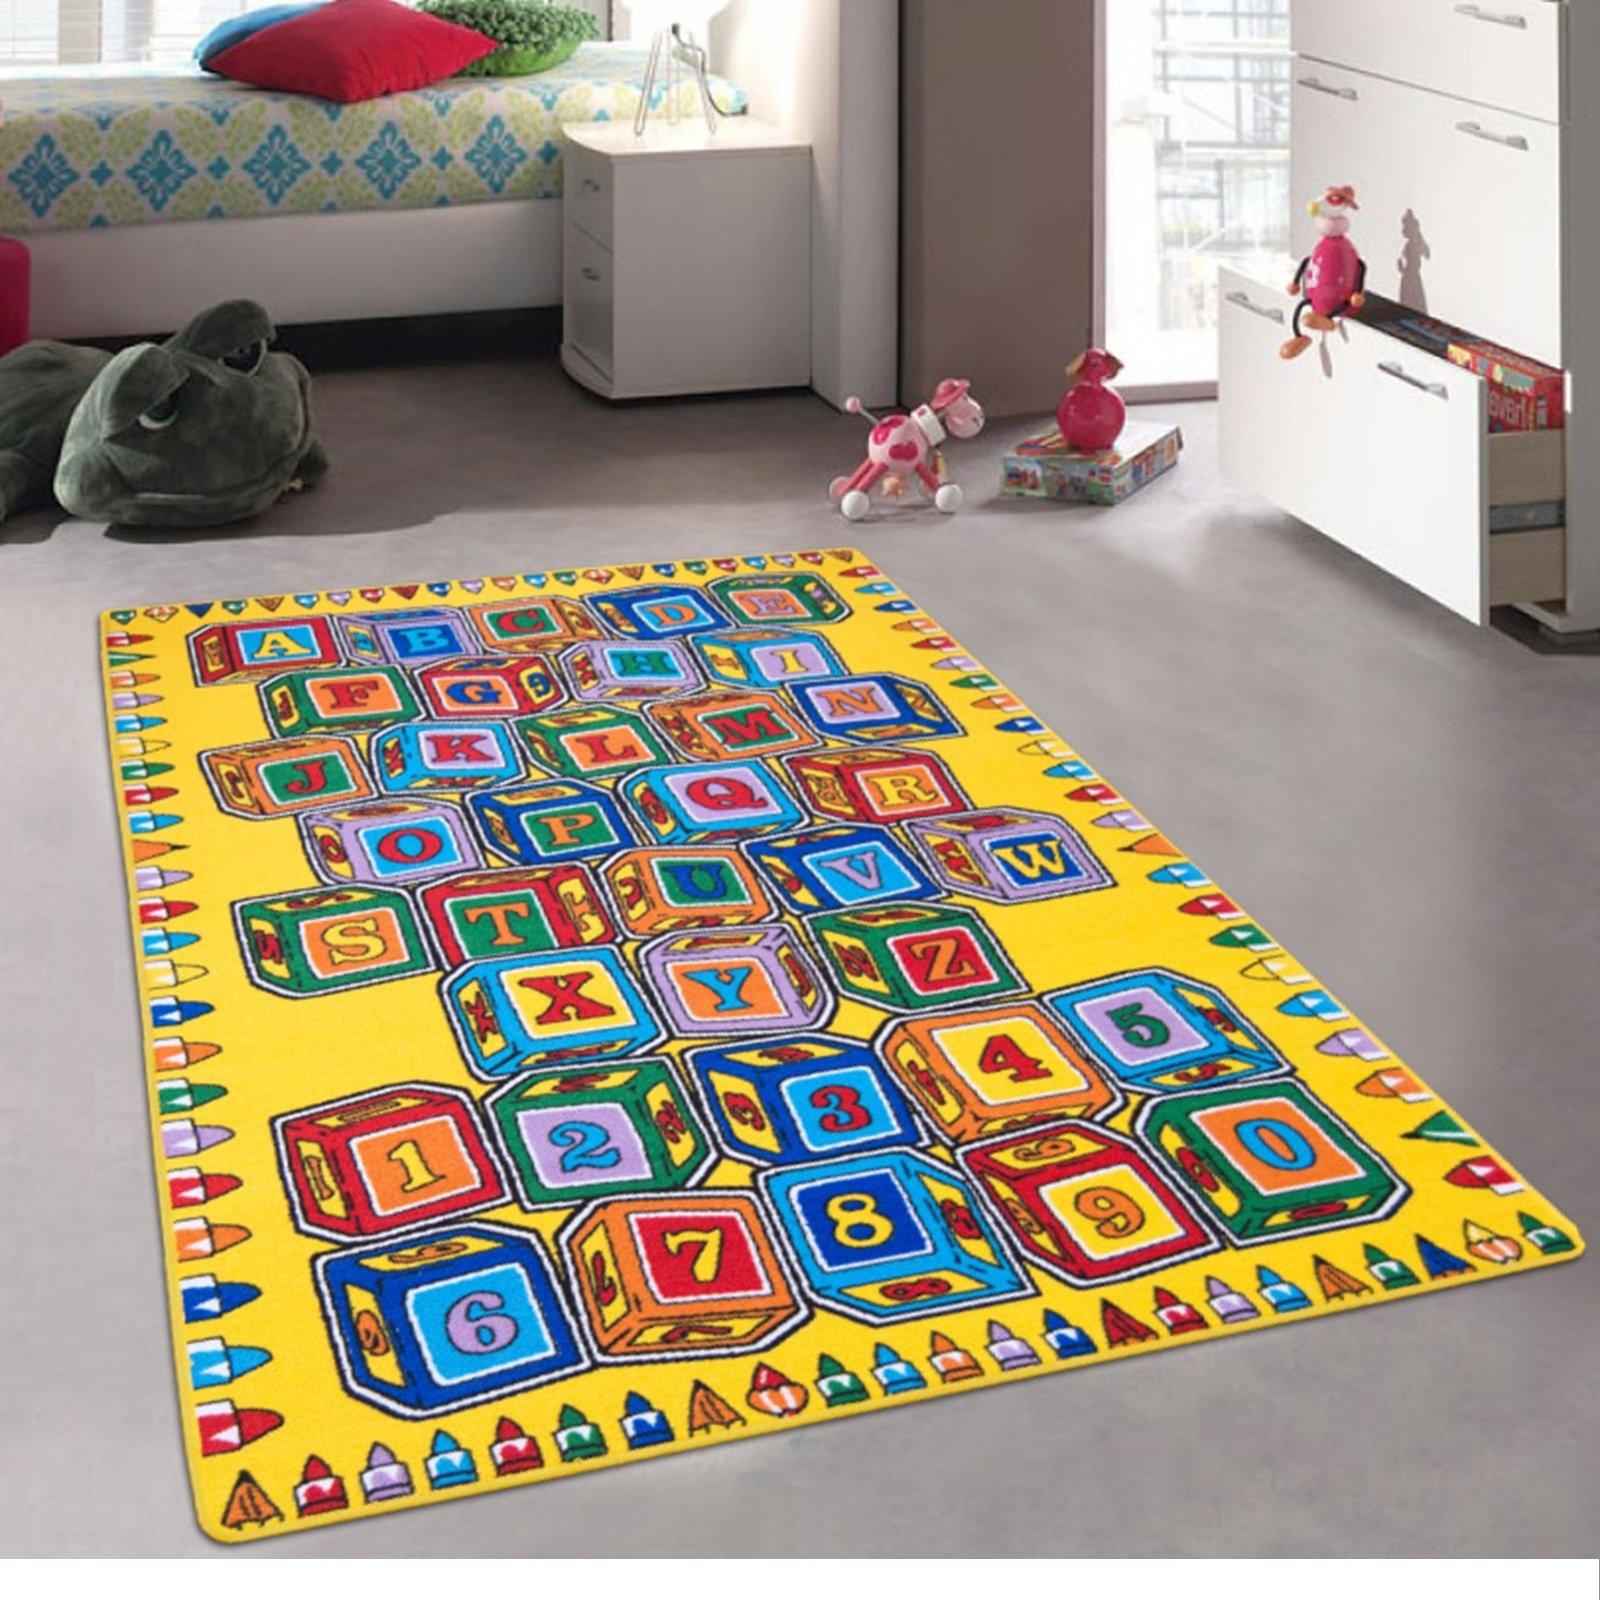 CR's Kids / Daycare / Classroom / Playroom Area Rug. (A-Z AND 1-9) Alphabet. Numbers. Blocks. Educational. Fun. Non-Slip Gel Back. Play Mat (8 Feet X 10 Feet)